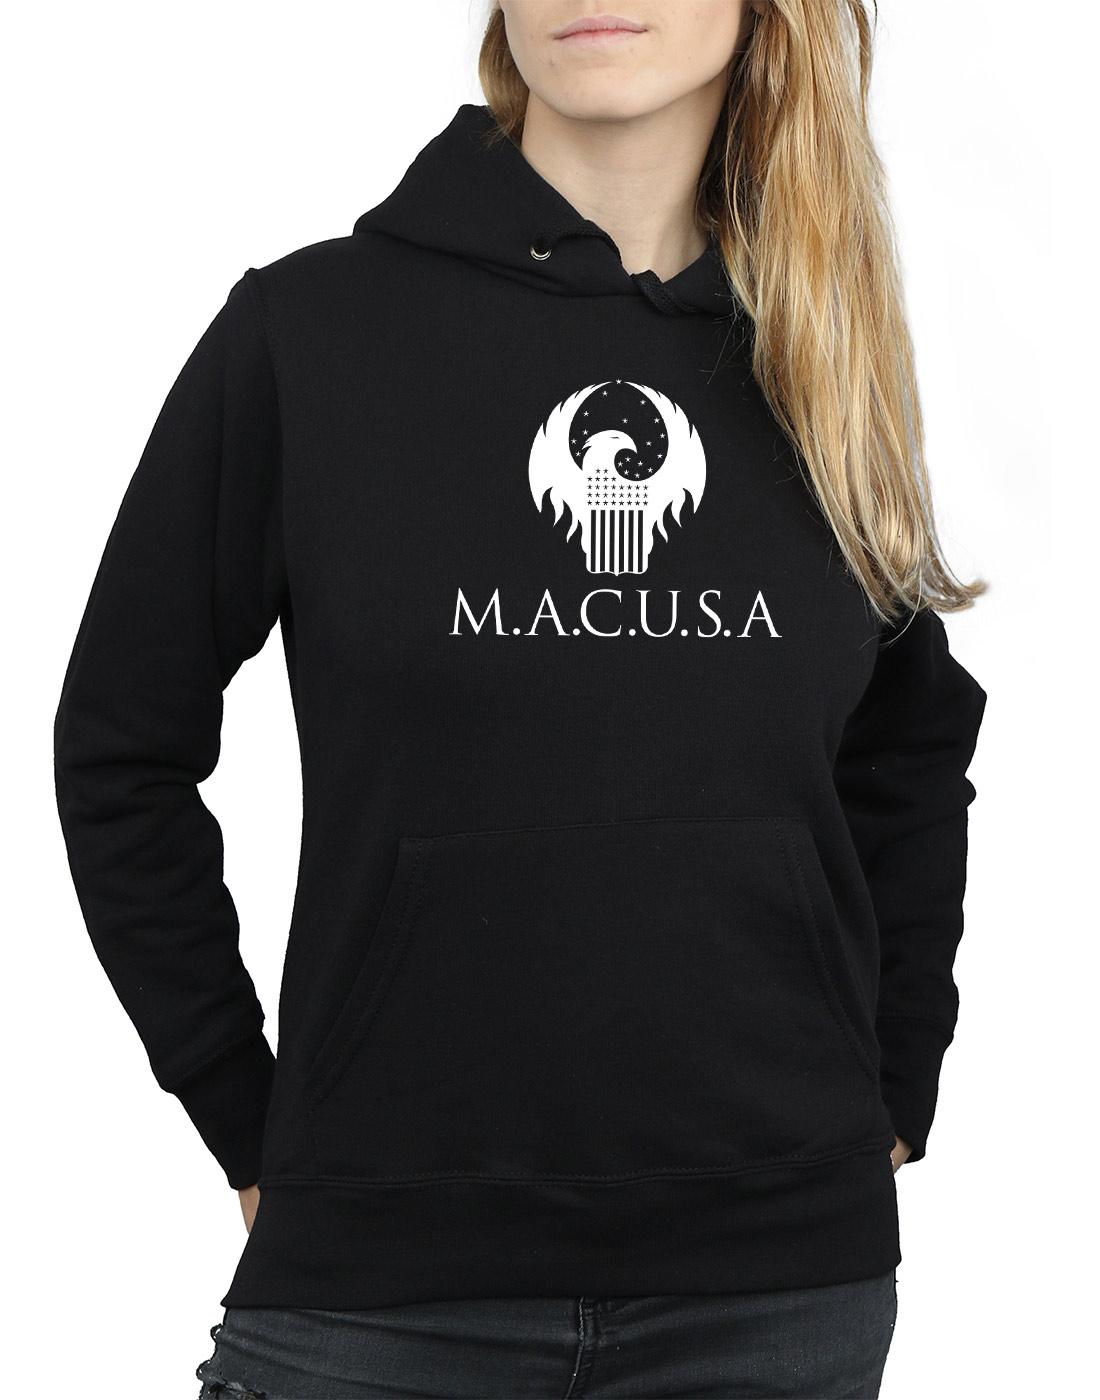 Donna Beasts Fantastic Felpa Cappuccio Macusa Con Logo 5TwfFxw4